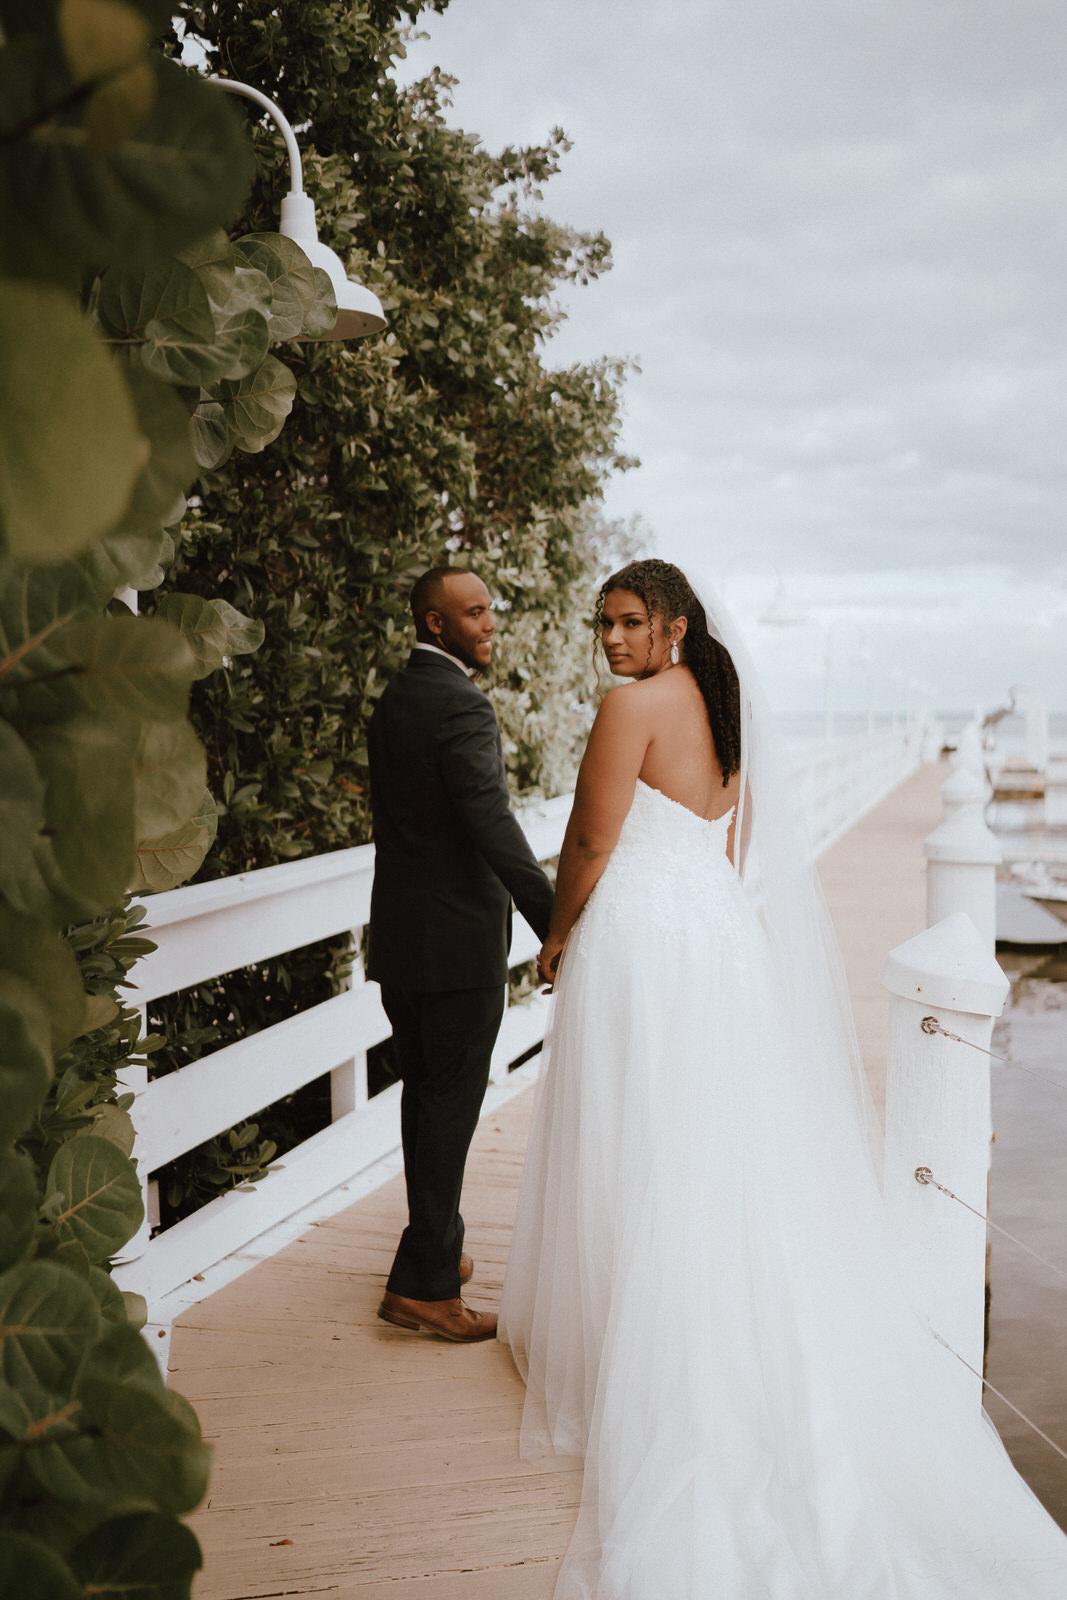 South Seas Island Resort Elopement- Alyana and Shawn- Michelle Gonzalez Photography-364.JPG